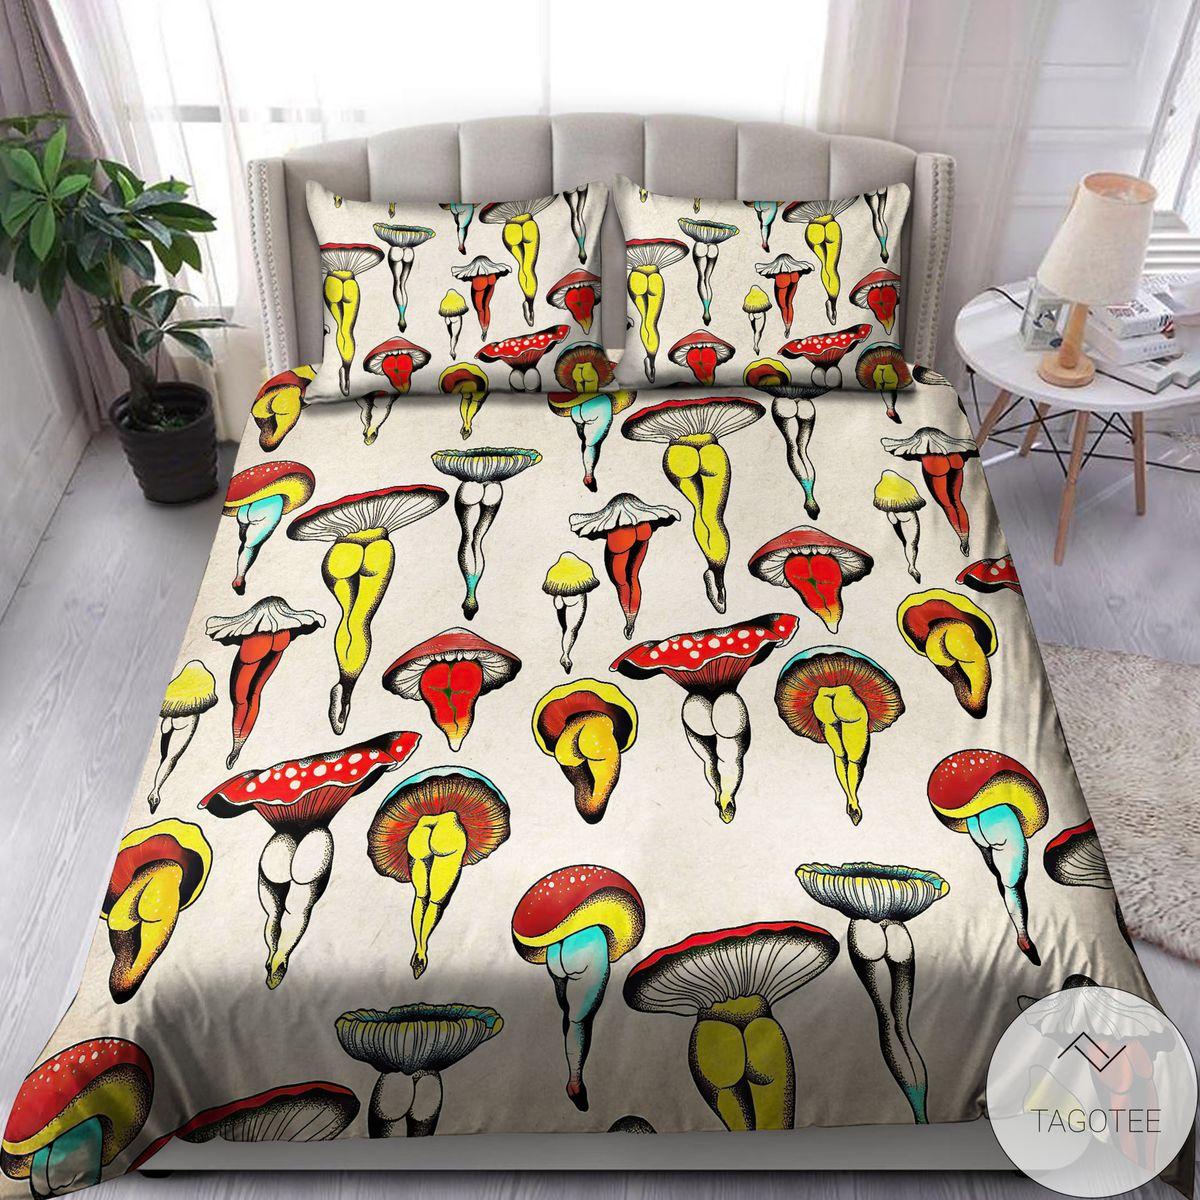 Sexy-Hippie-Mushroom-Bedding-Set